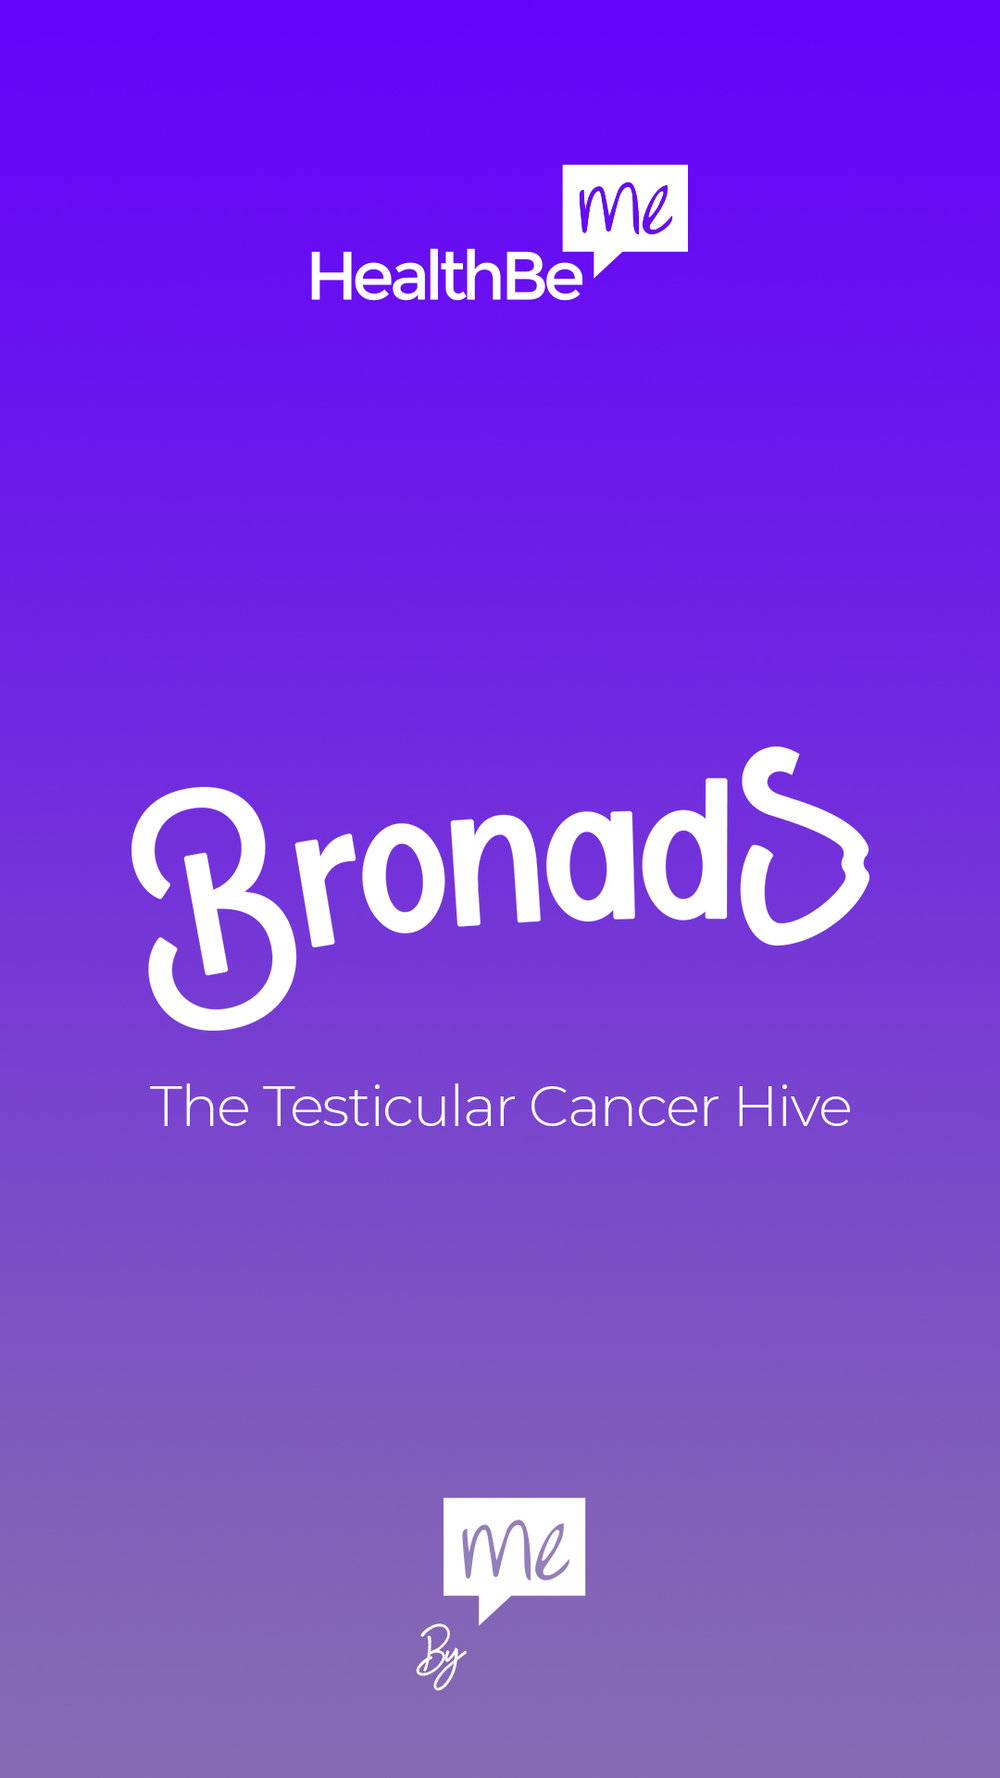 Bronads_cover.jpg